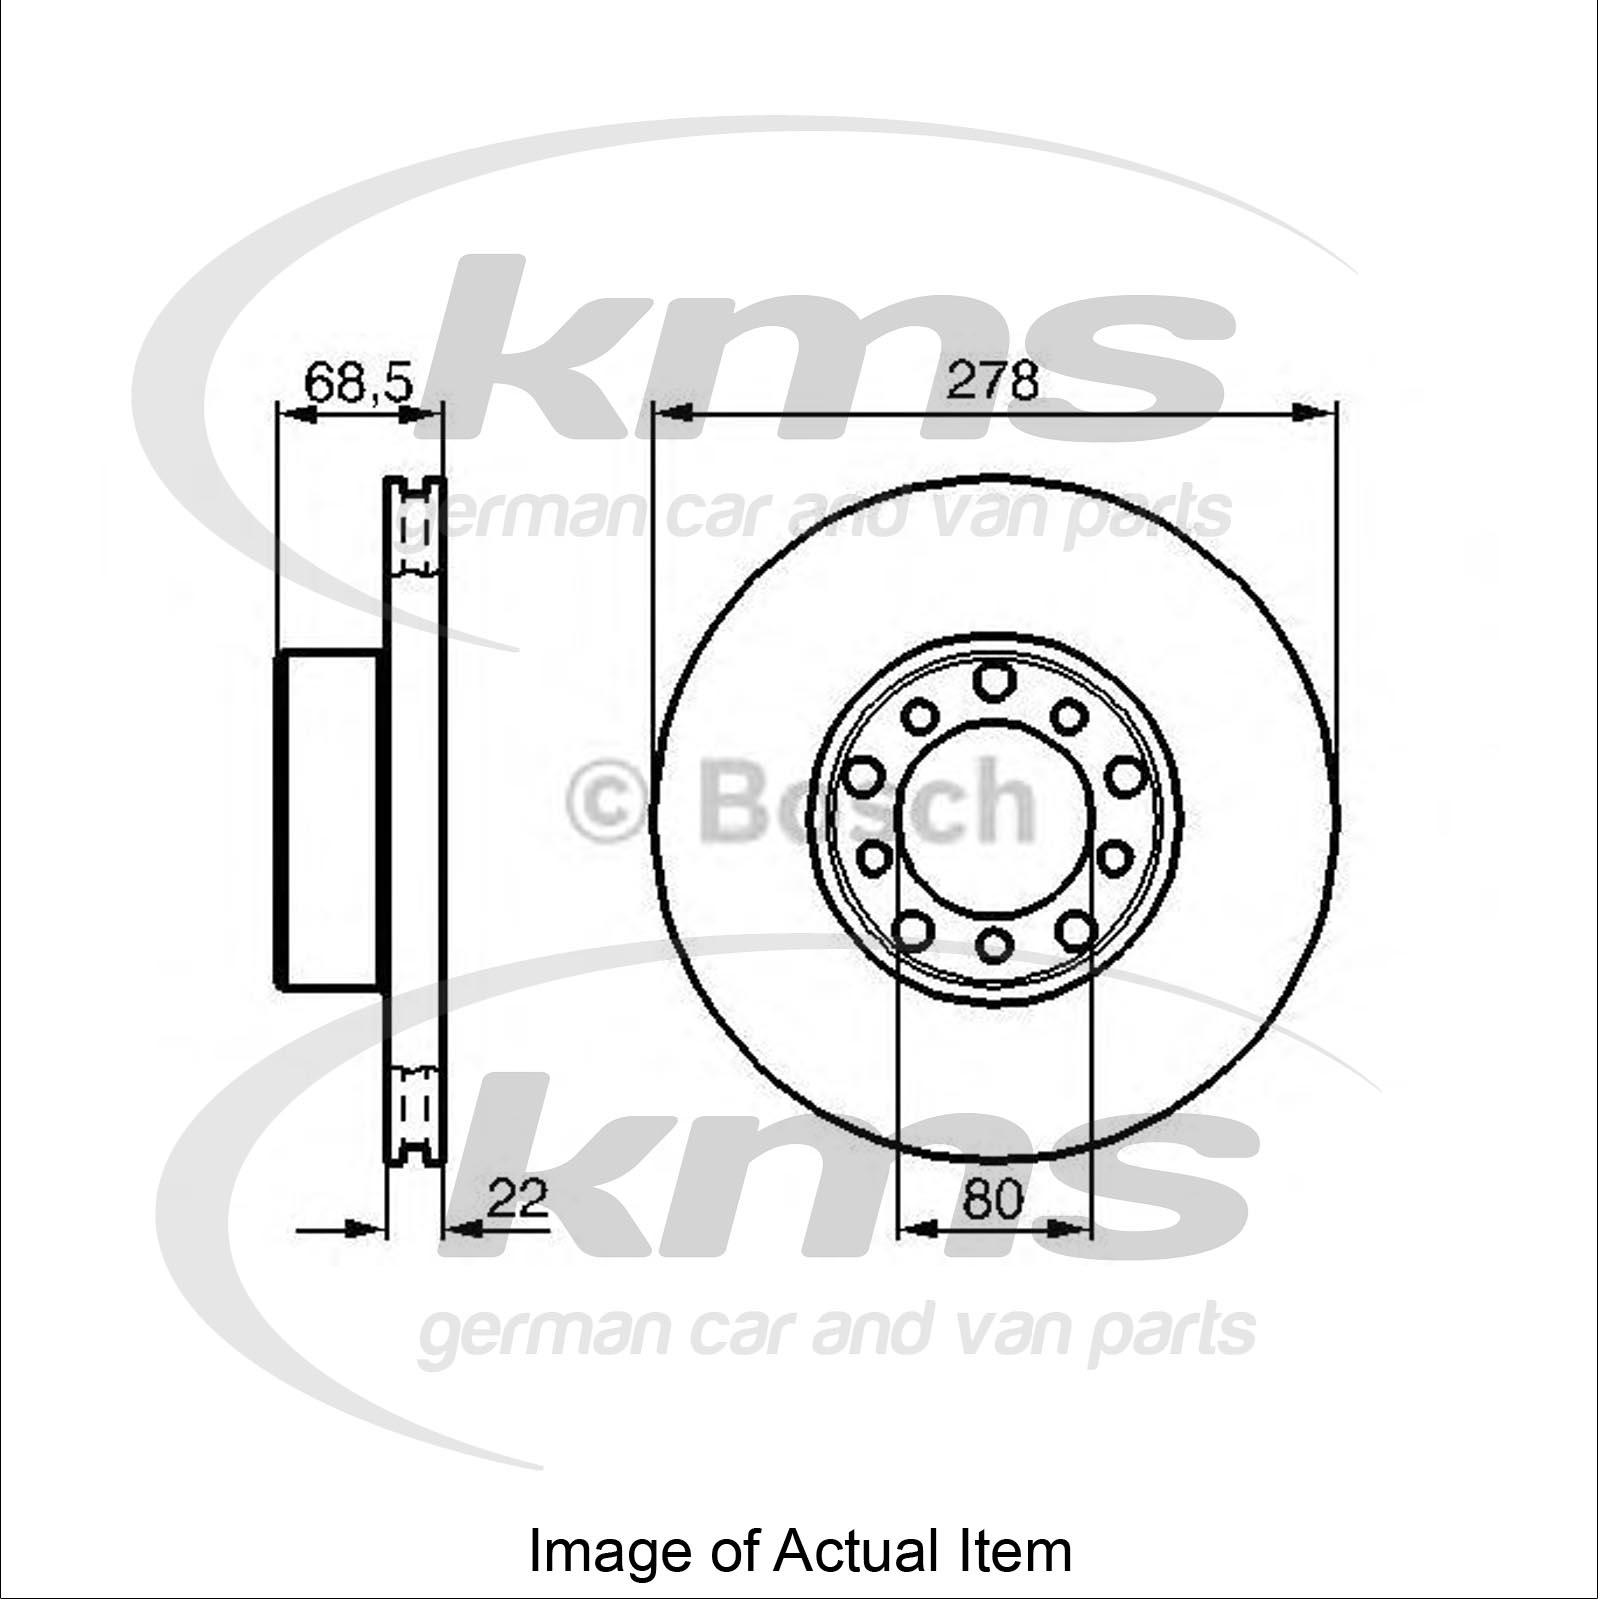 Mercedes Benz 230e Engine Diagram. Mercedes. Auto Wiring